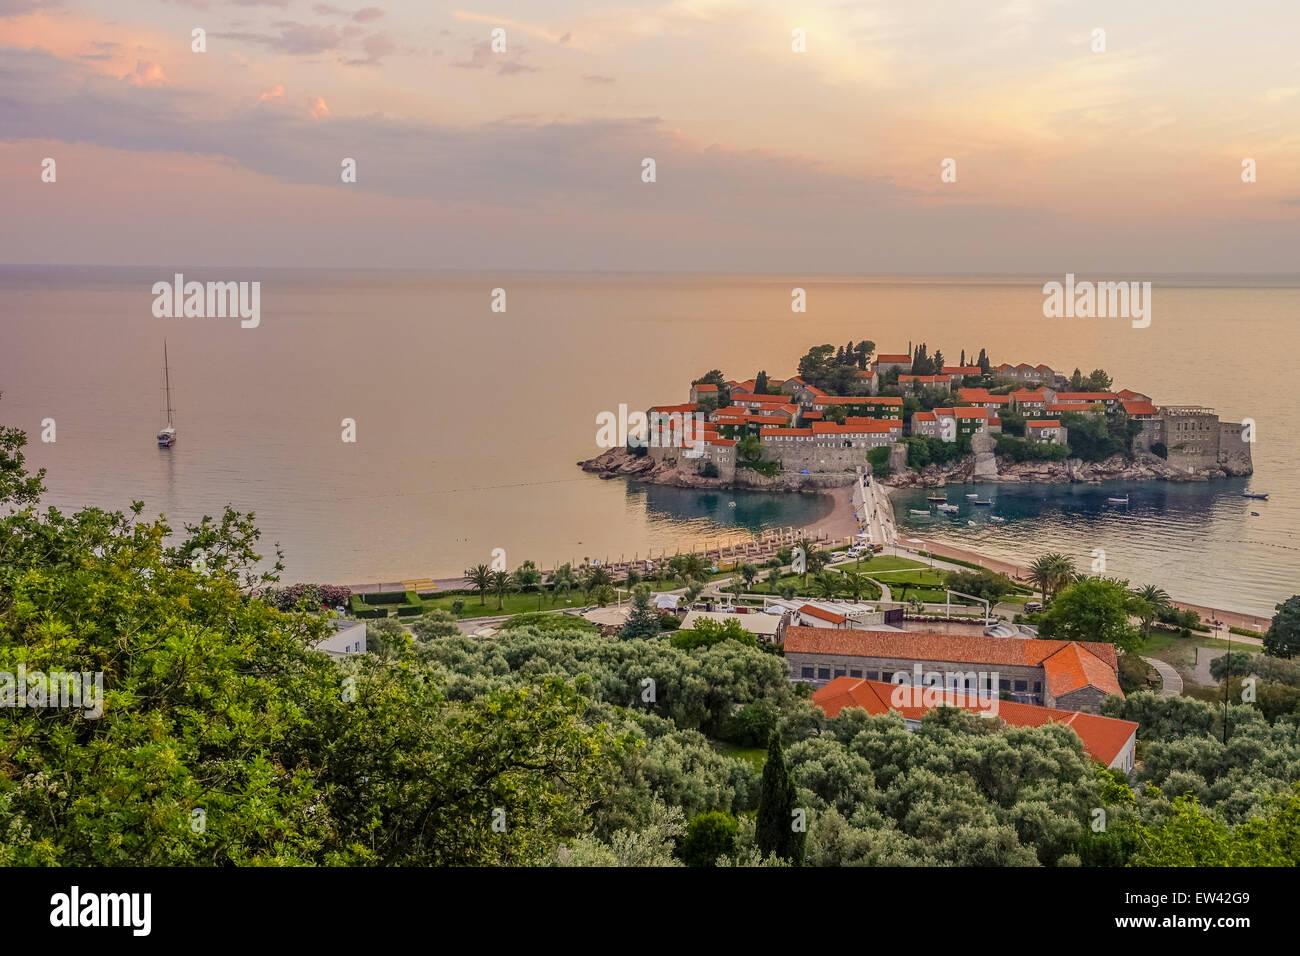 Luxery tourism ressort, peninsula Sveti Stefan, Montenegro, Sveti Stefan - Stock Image